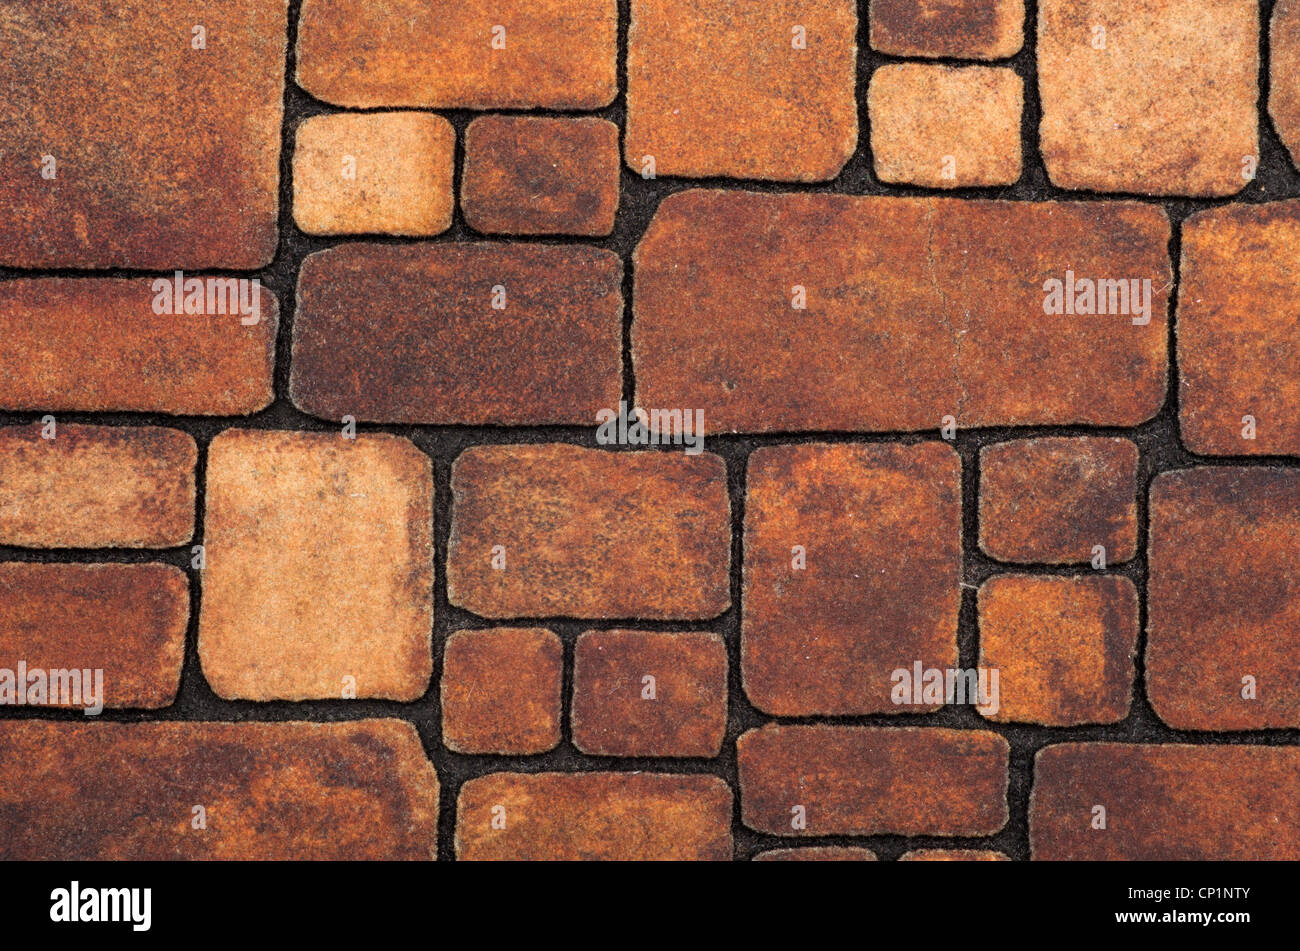 Fondo de textura de pared de piedra Imagen De Stock